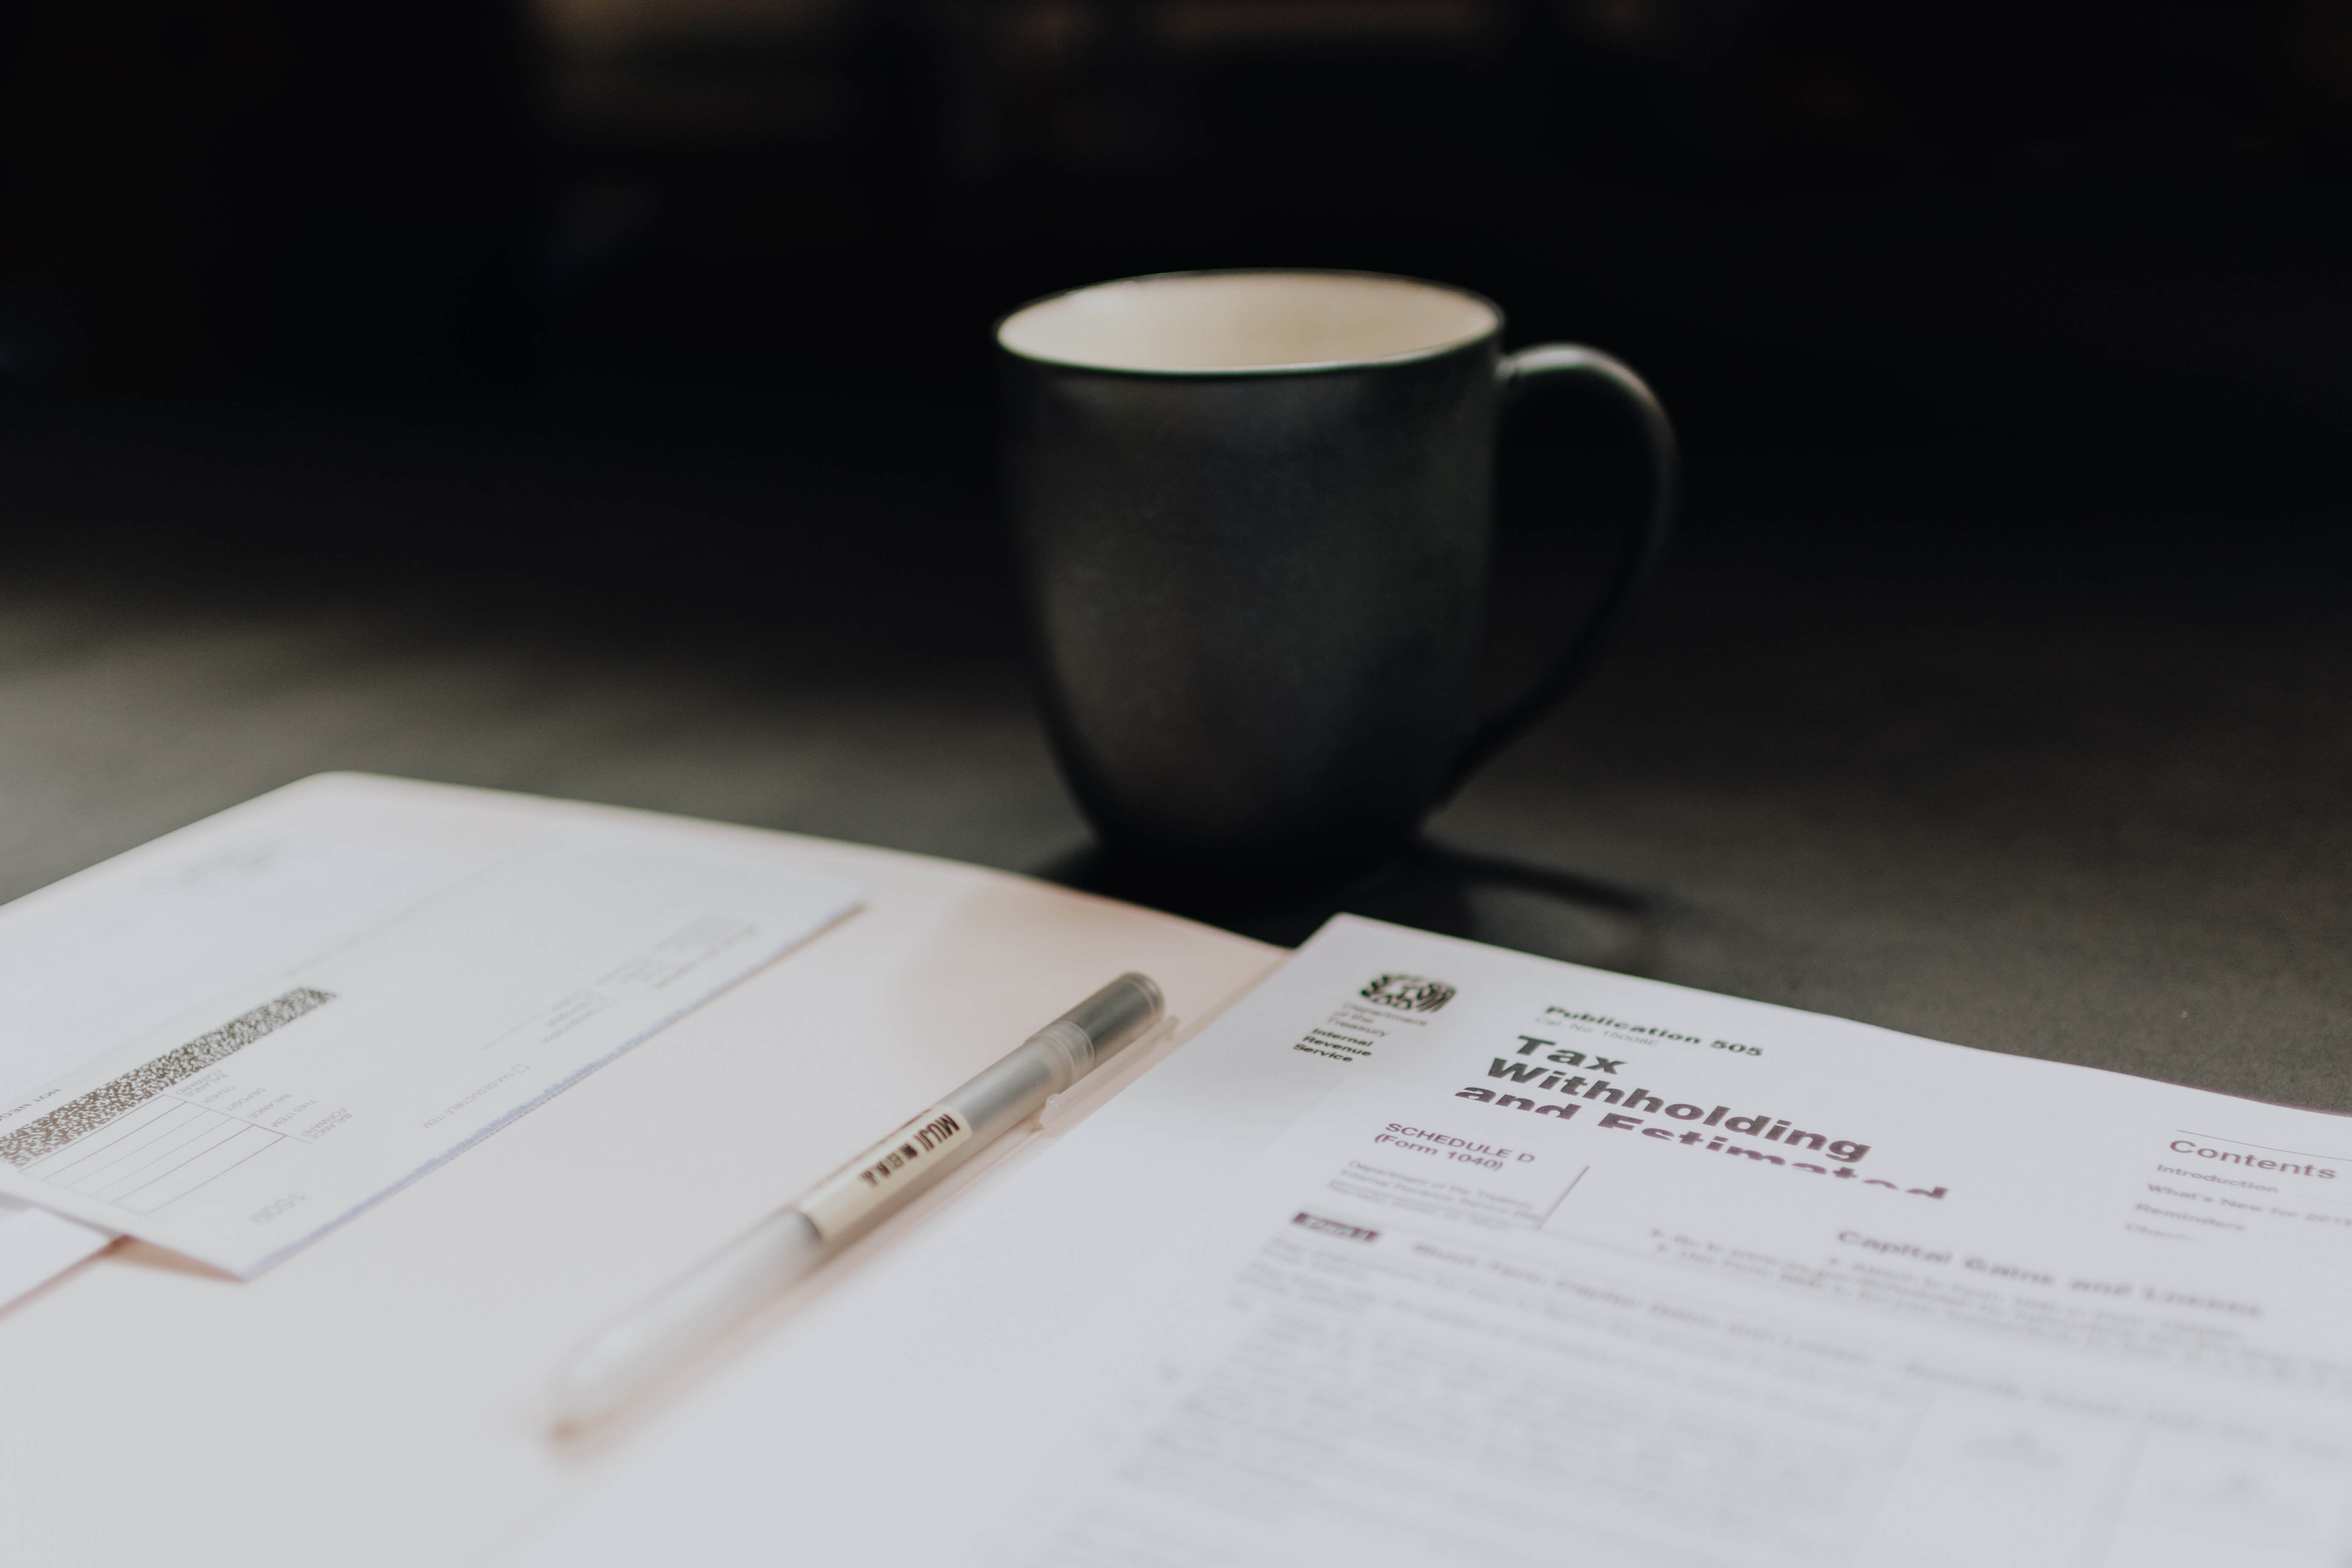 Documents and a mug